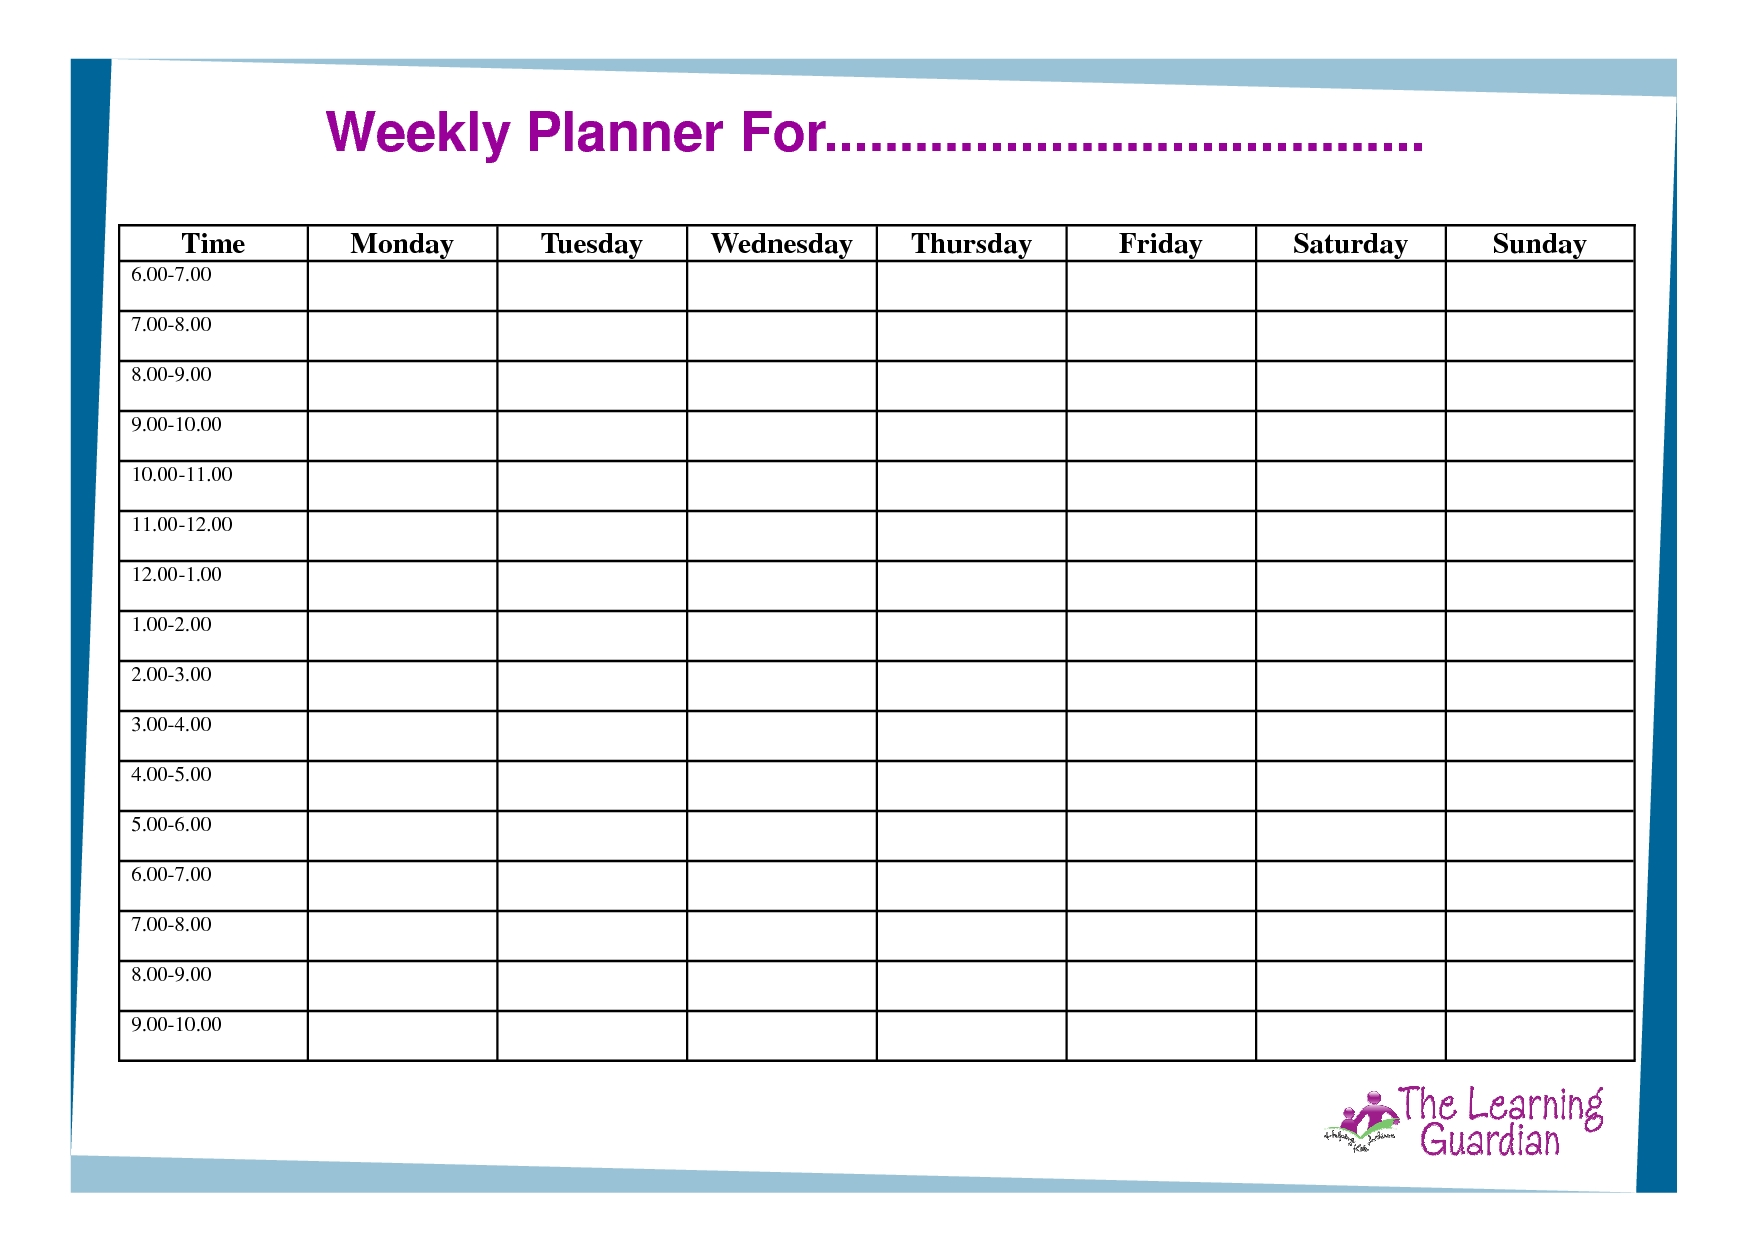 Free Printable Weekly Calendar Templates | Weekly Planner For Time  Printable Weekly Planner With Times